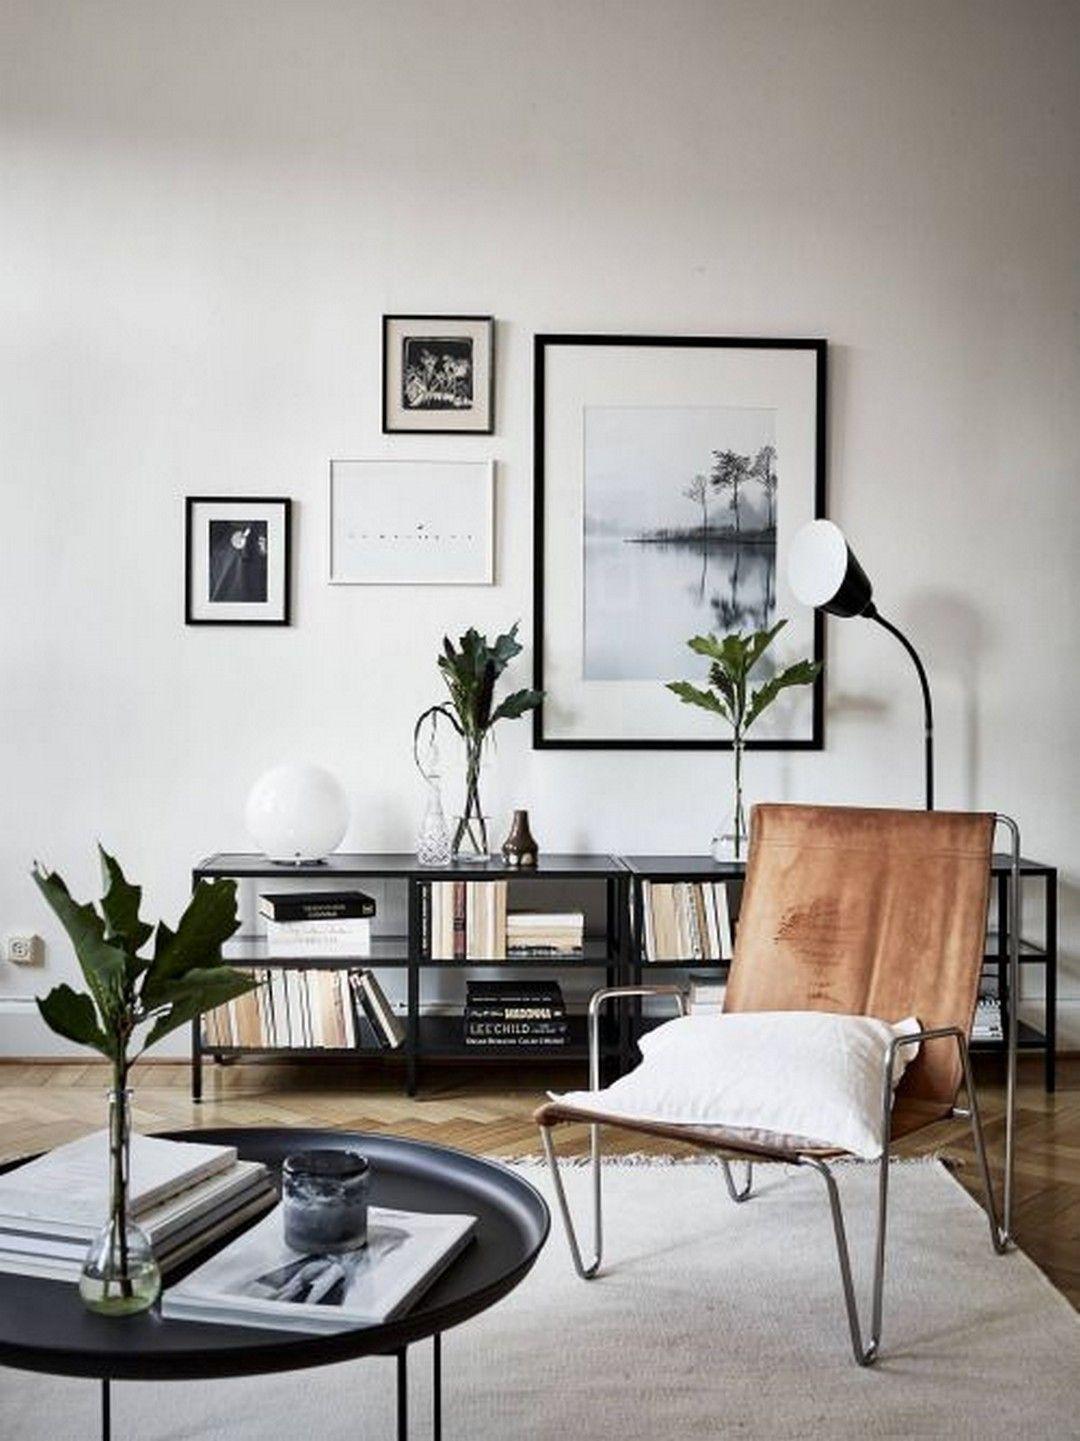 Elegant mens apartment masculine decor masculin idee for Ma maison minimaliste